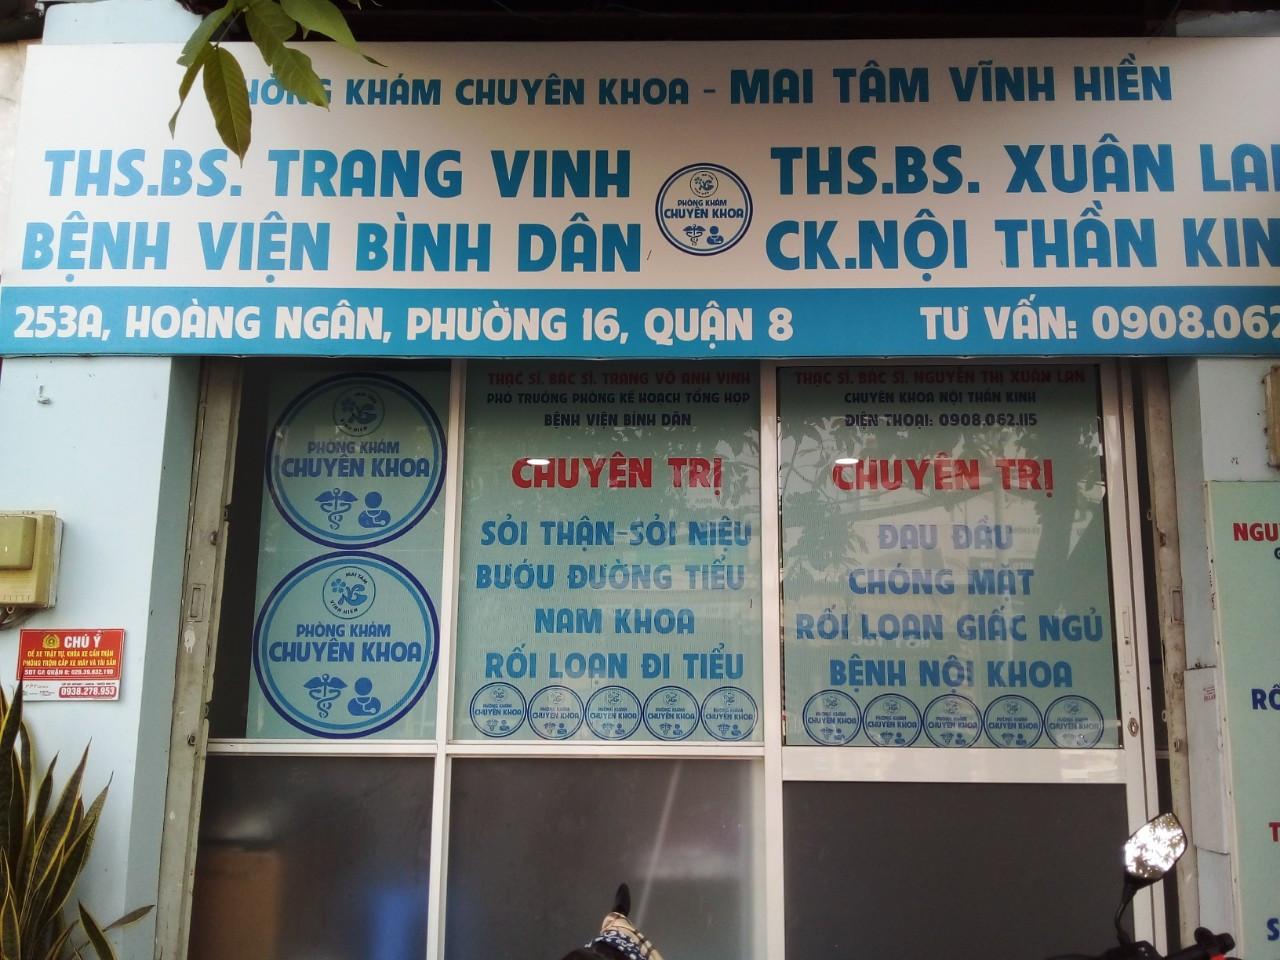 phong kham nam khoa tot nhat tphcm